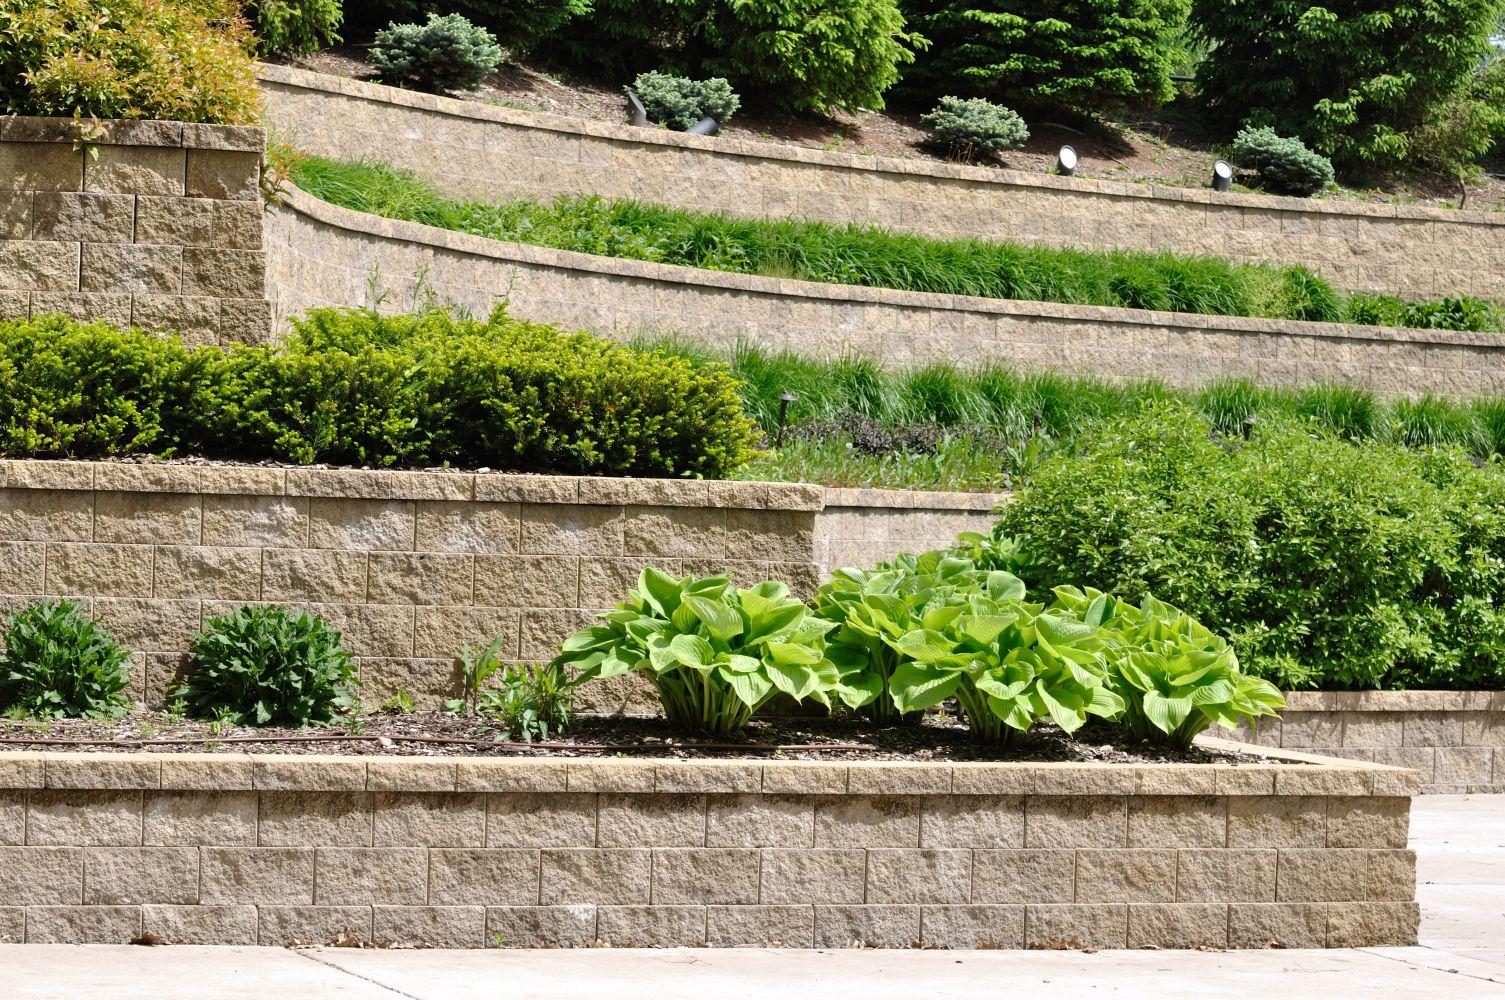 Commercial landscape services in Cincinnati, OH